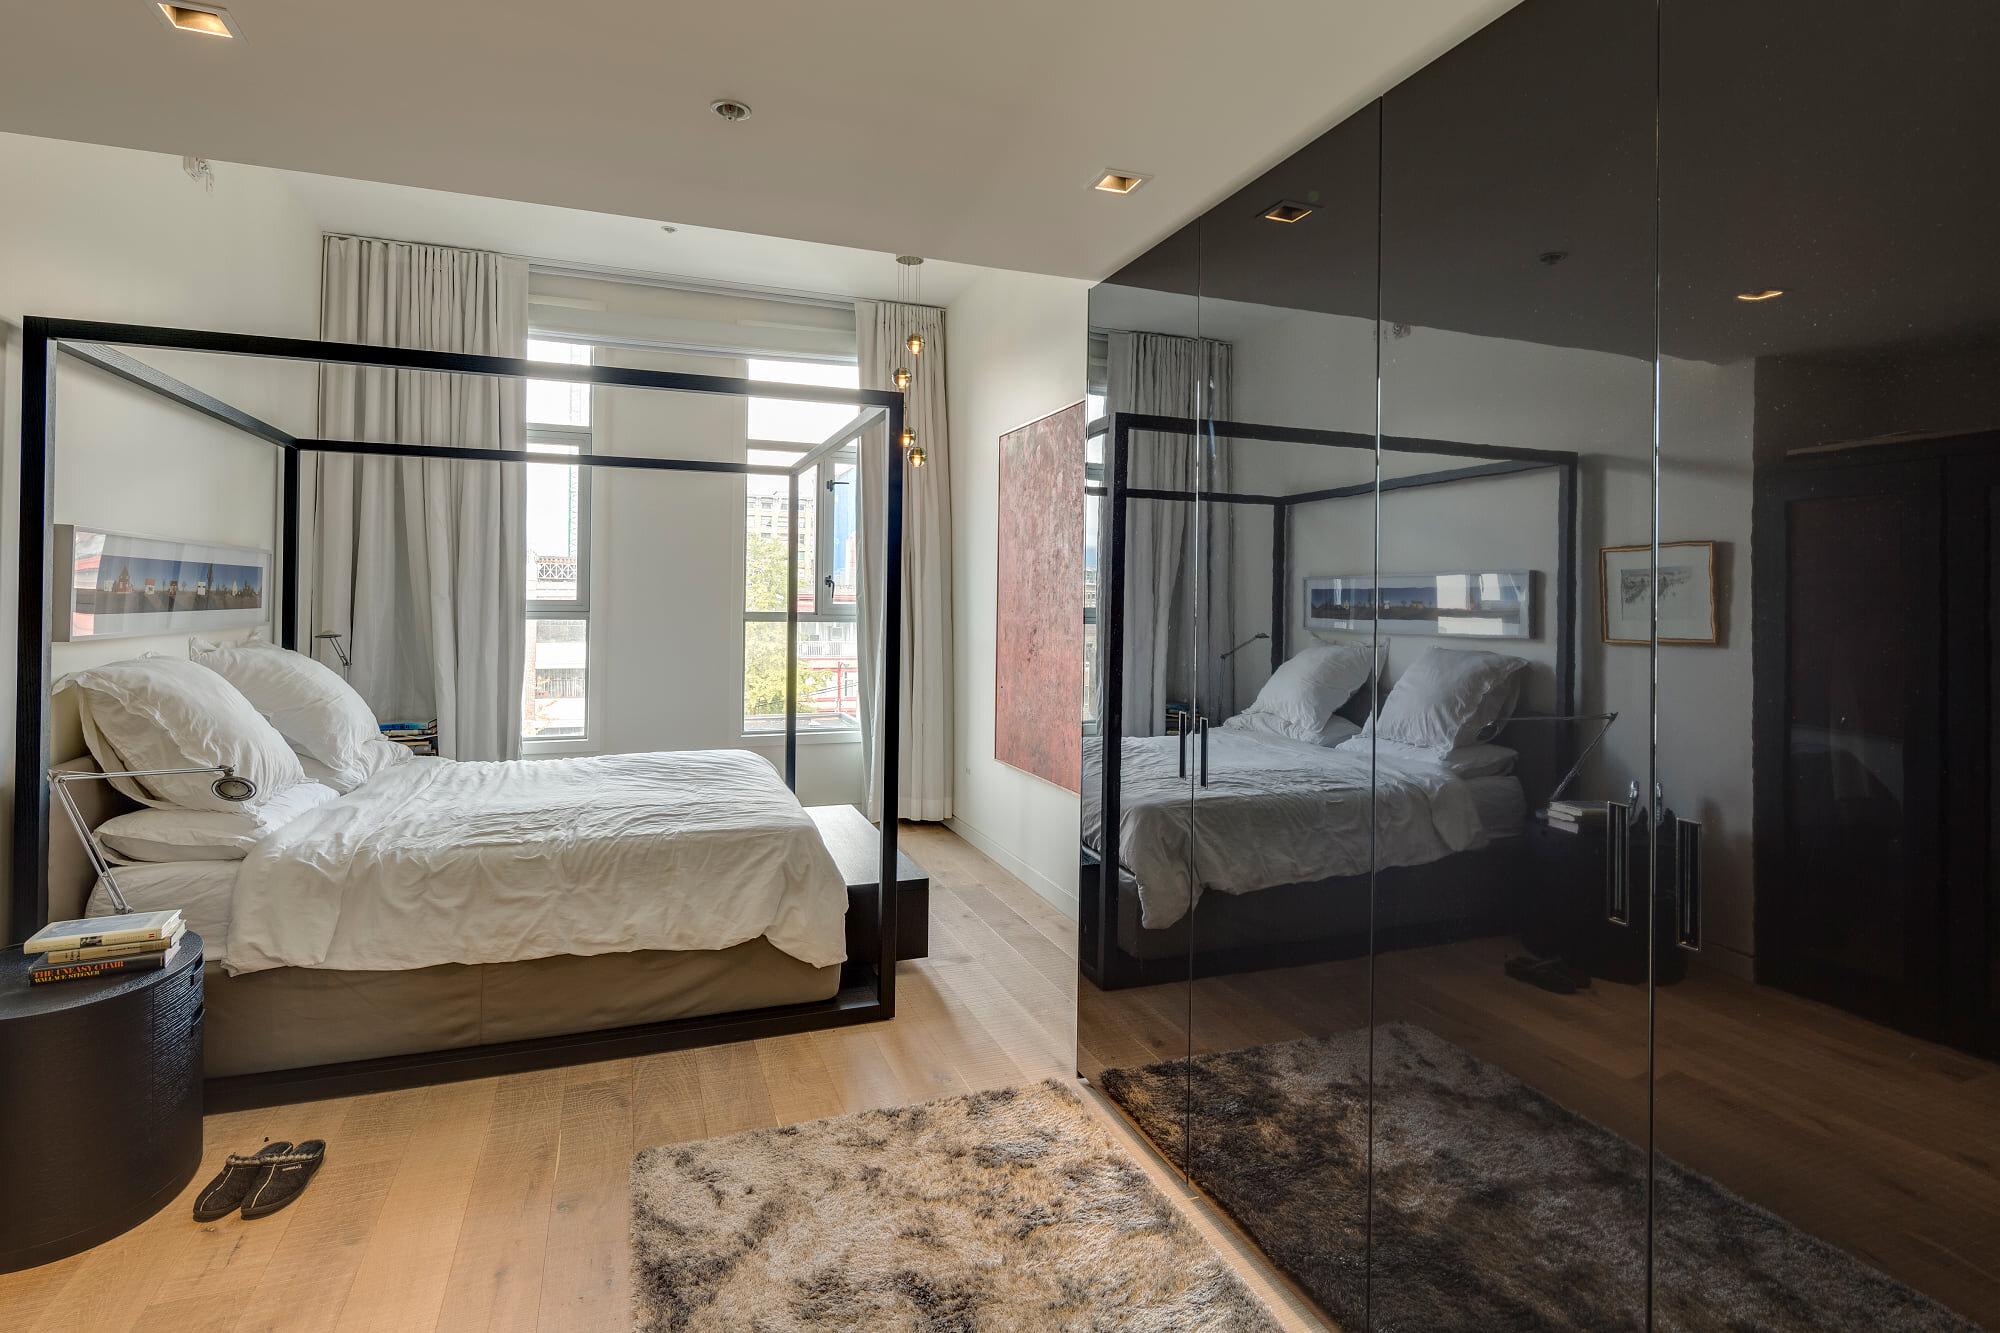 wsi-imageoptim-Sophisticated-Vancouver-bedroom-reno.jpg